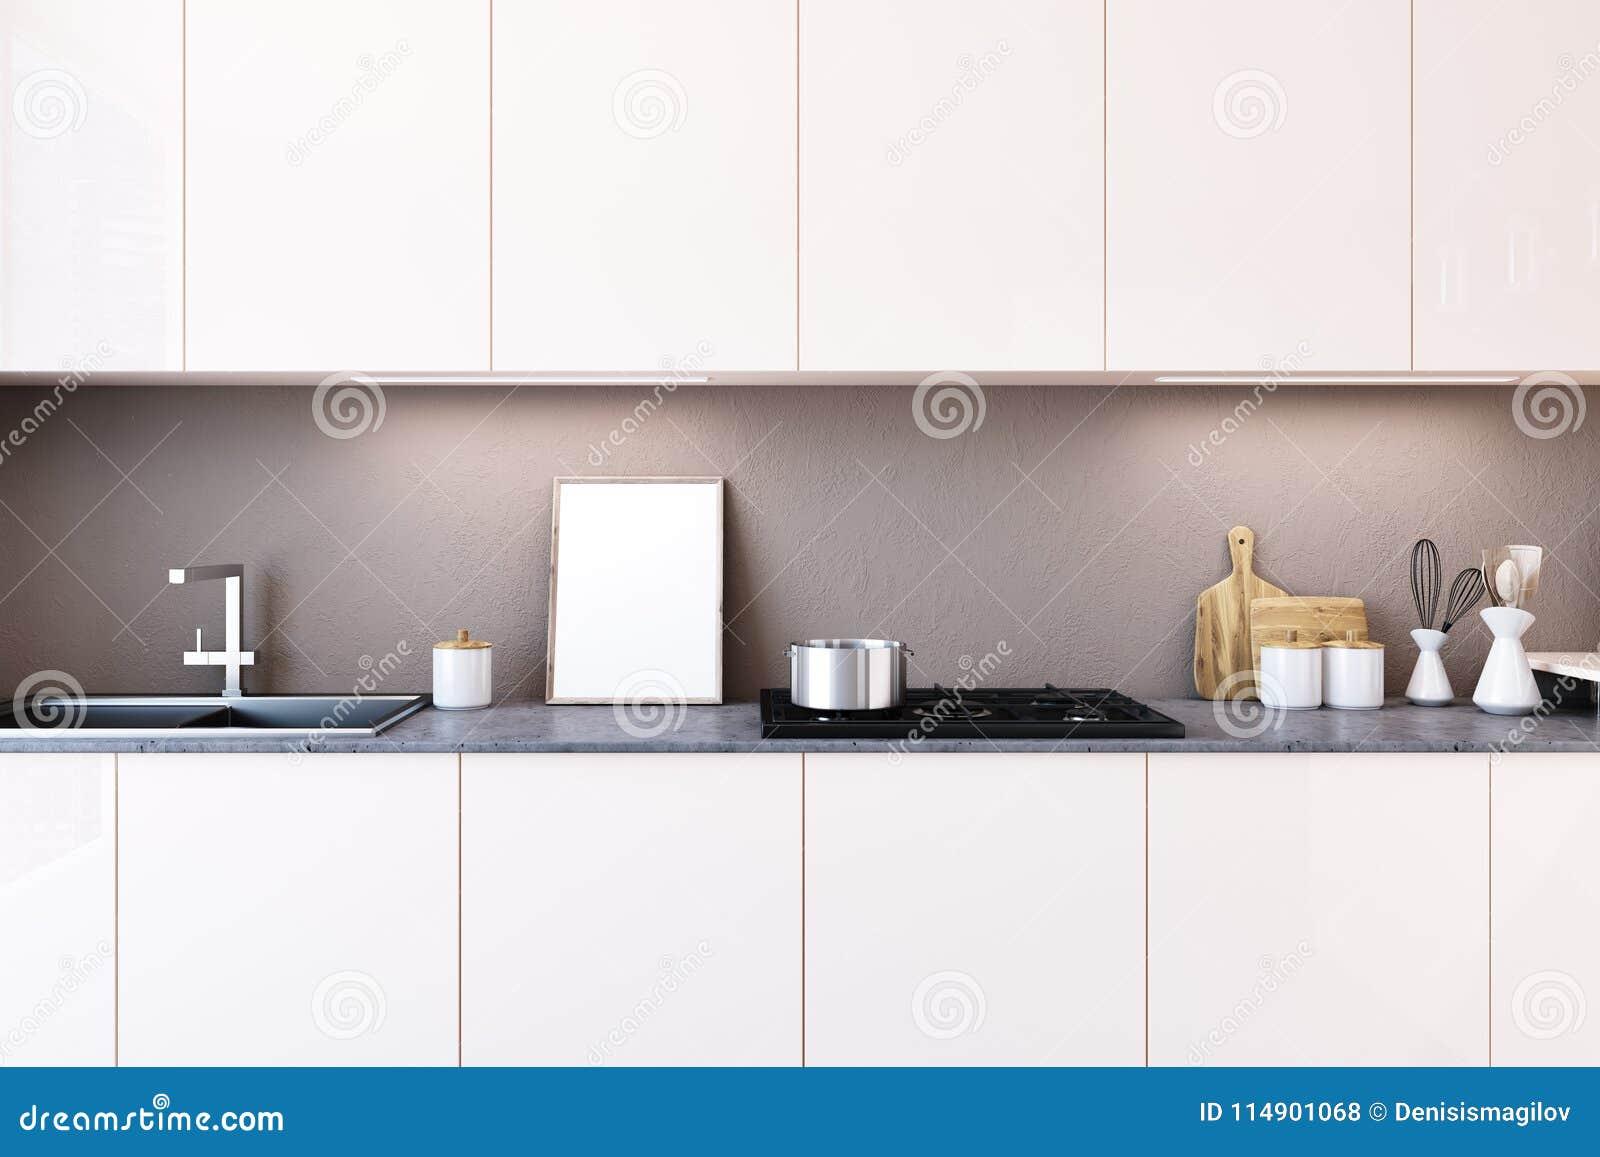 White Kitchen Countertop Poster Stock Illustration Illustration